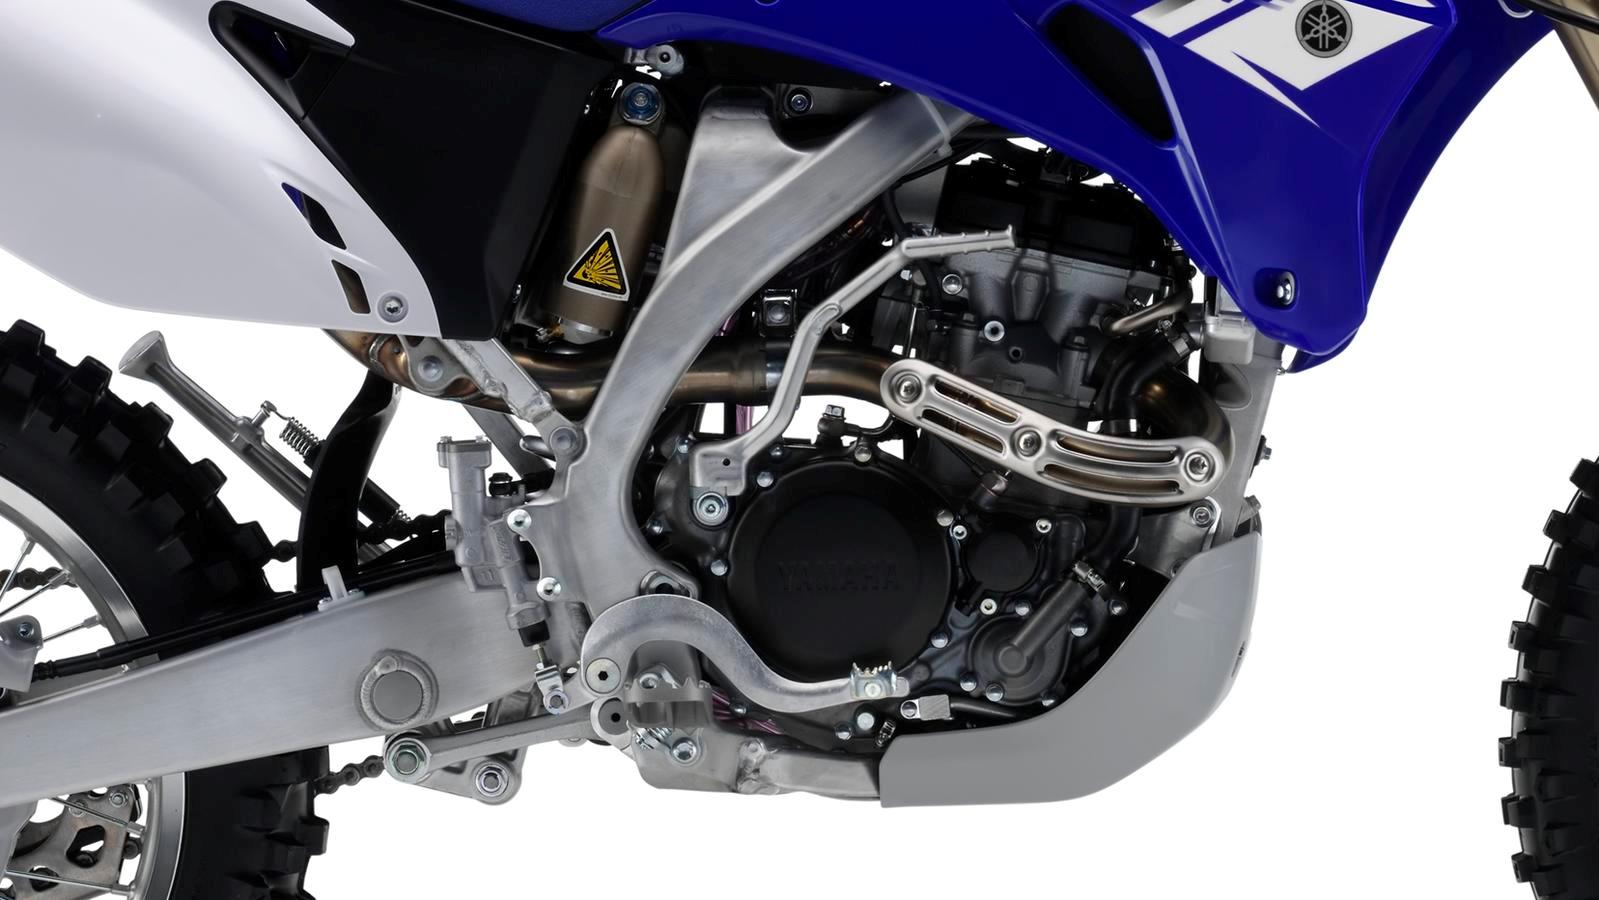 WR250F-EU-Racing-Blue-Detail-001_osob